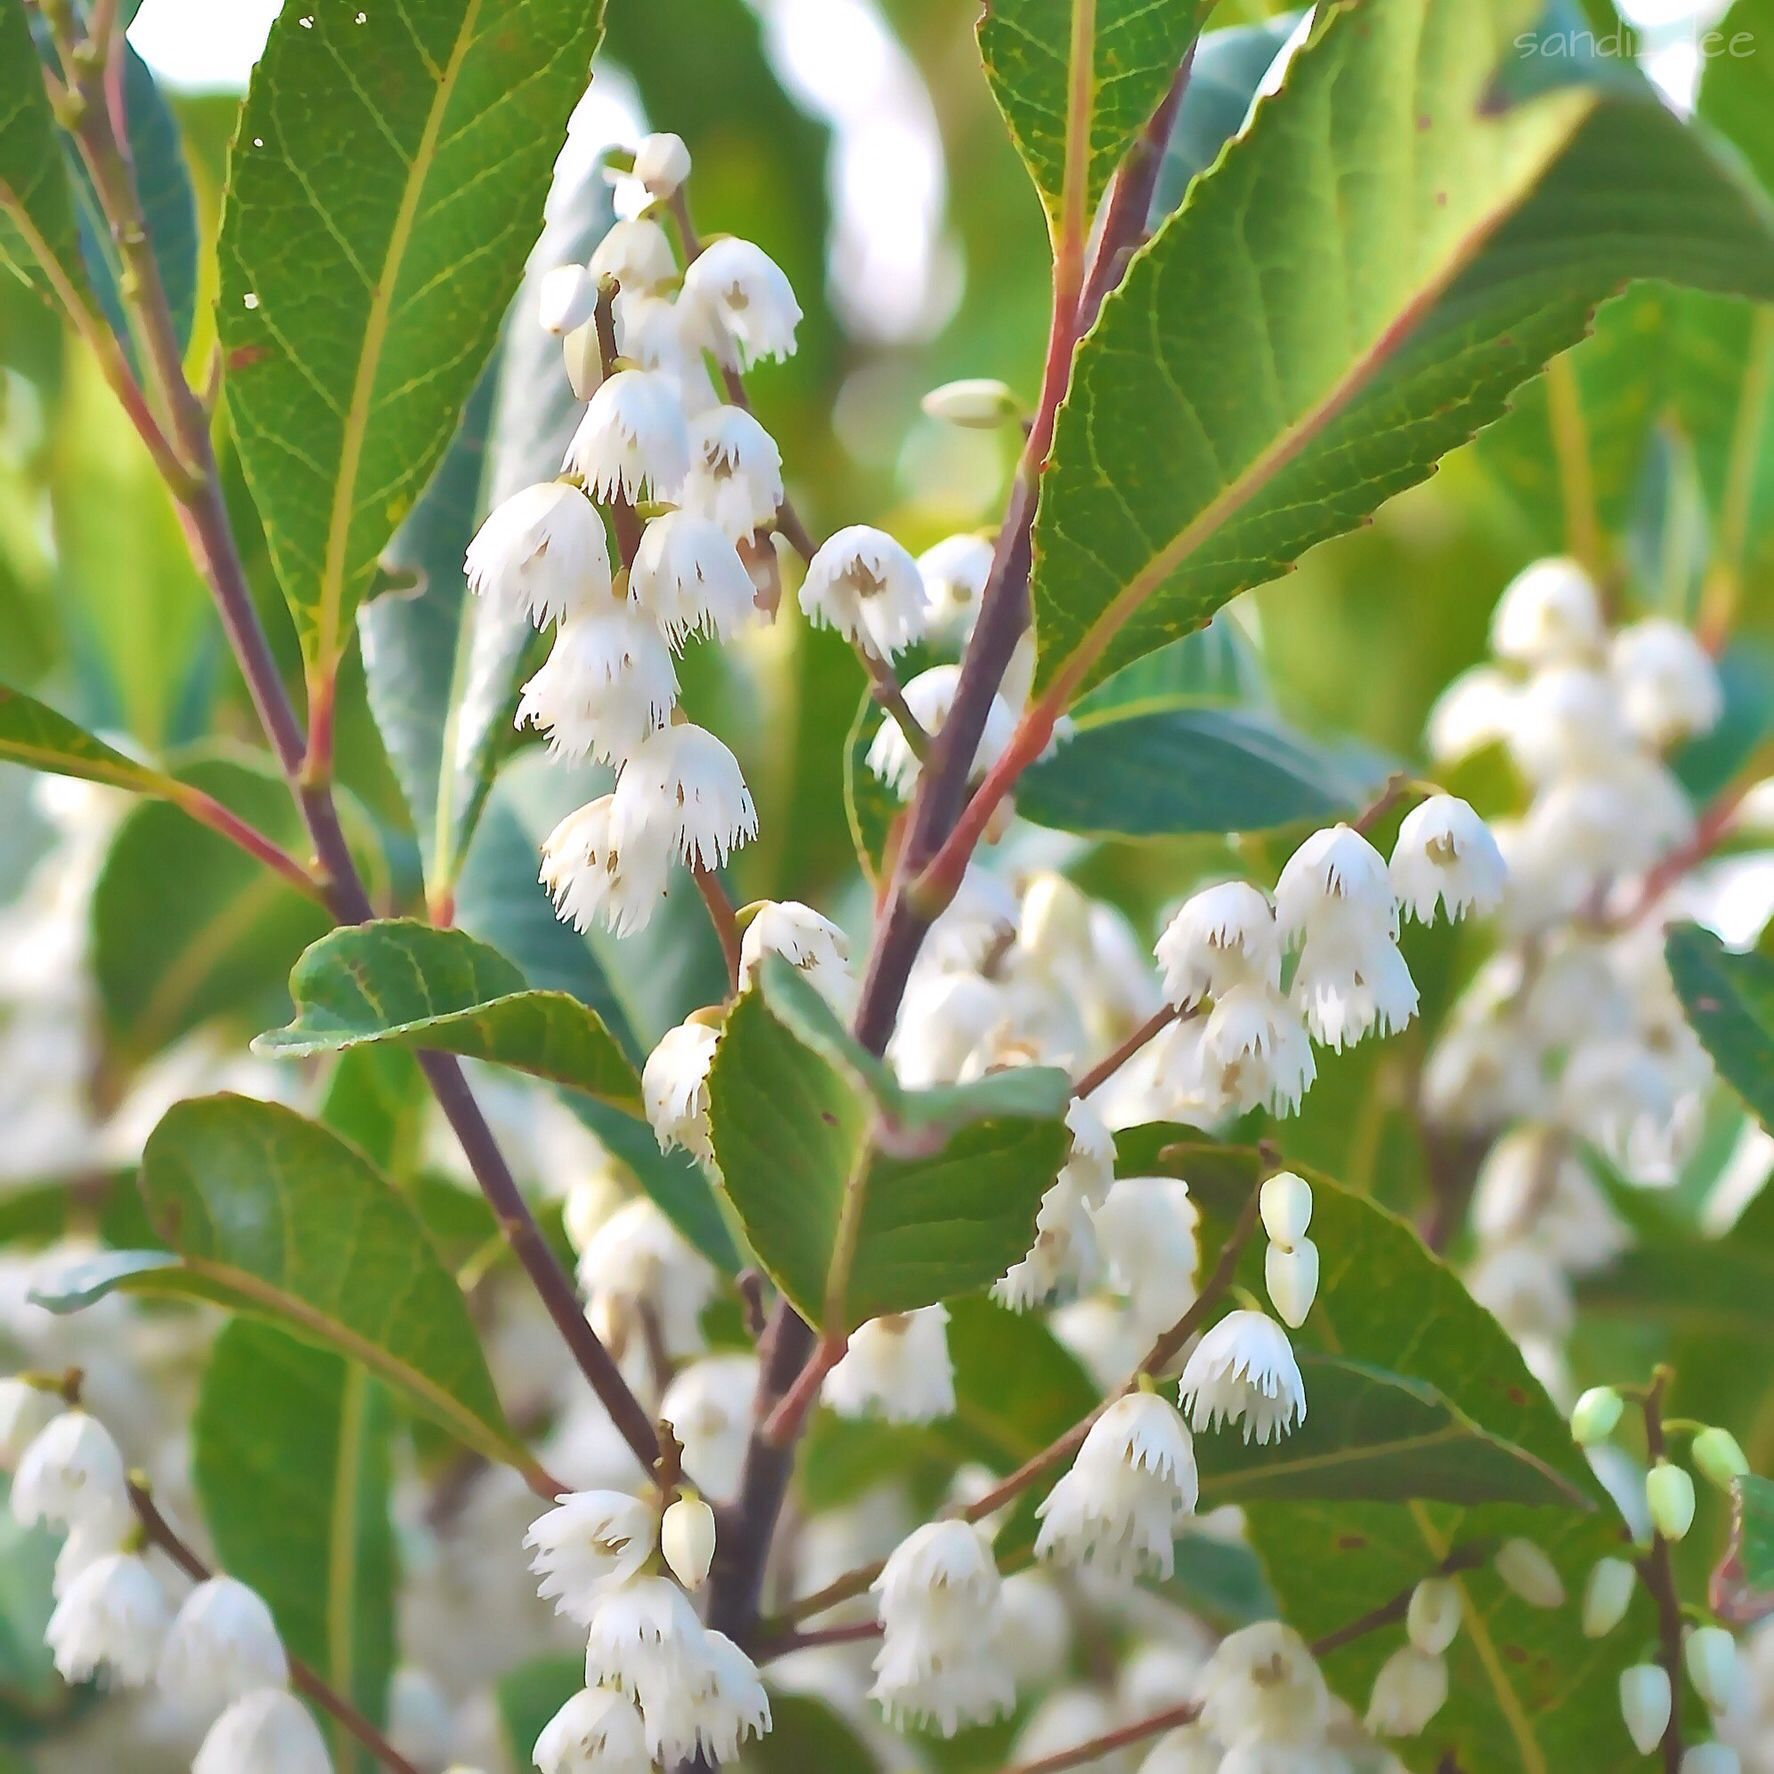 Australian native arrangement with eucalyptus buds, leaves